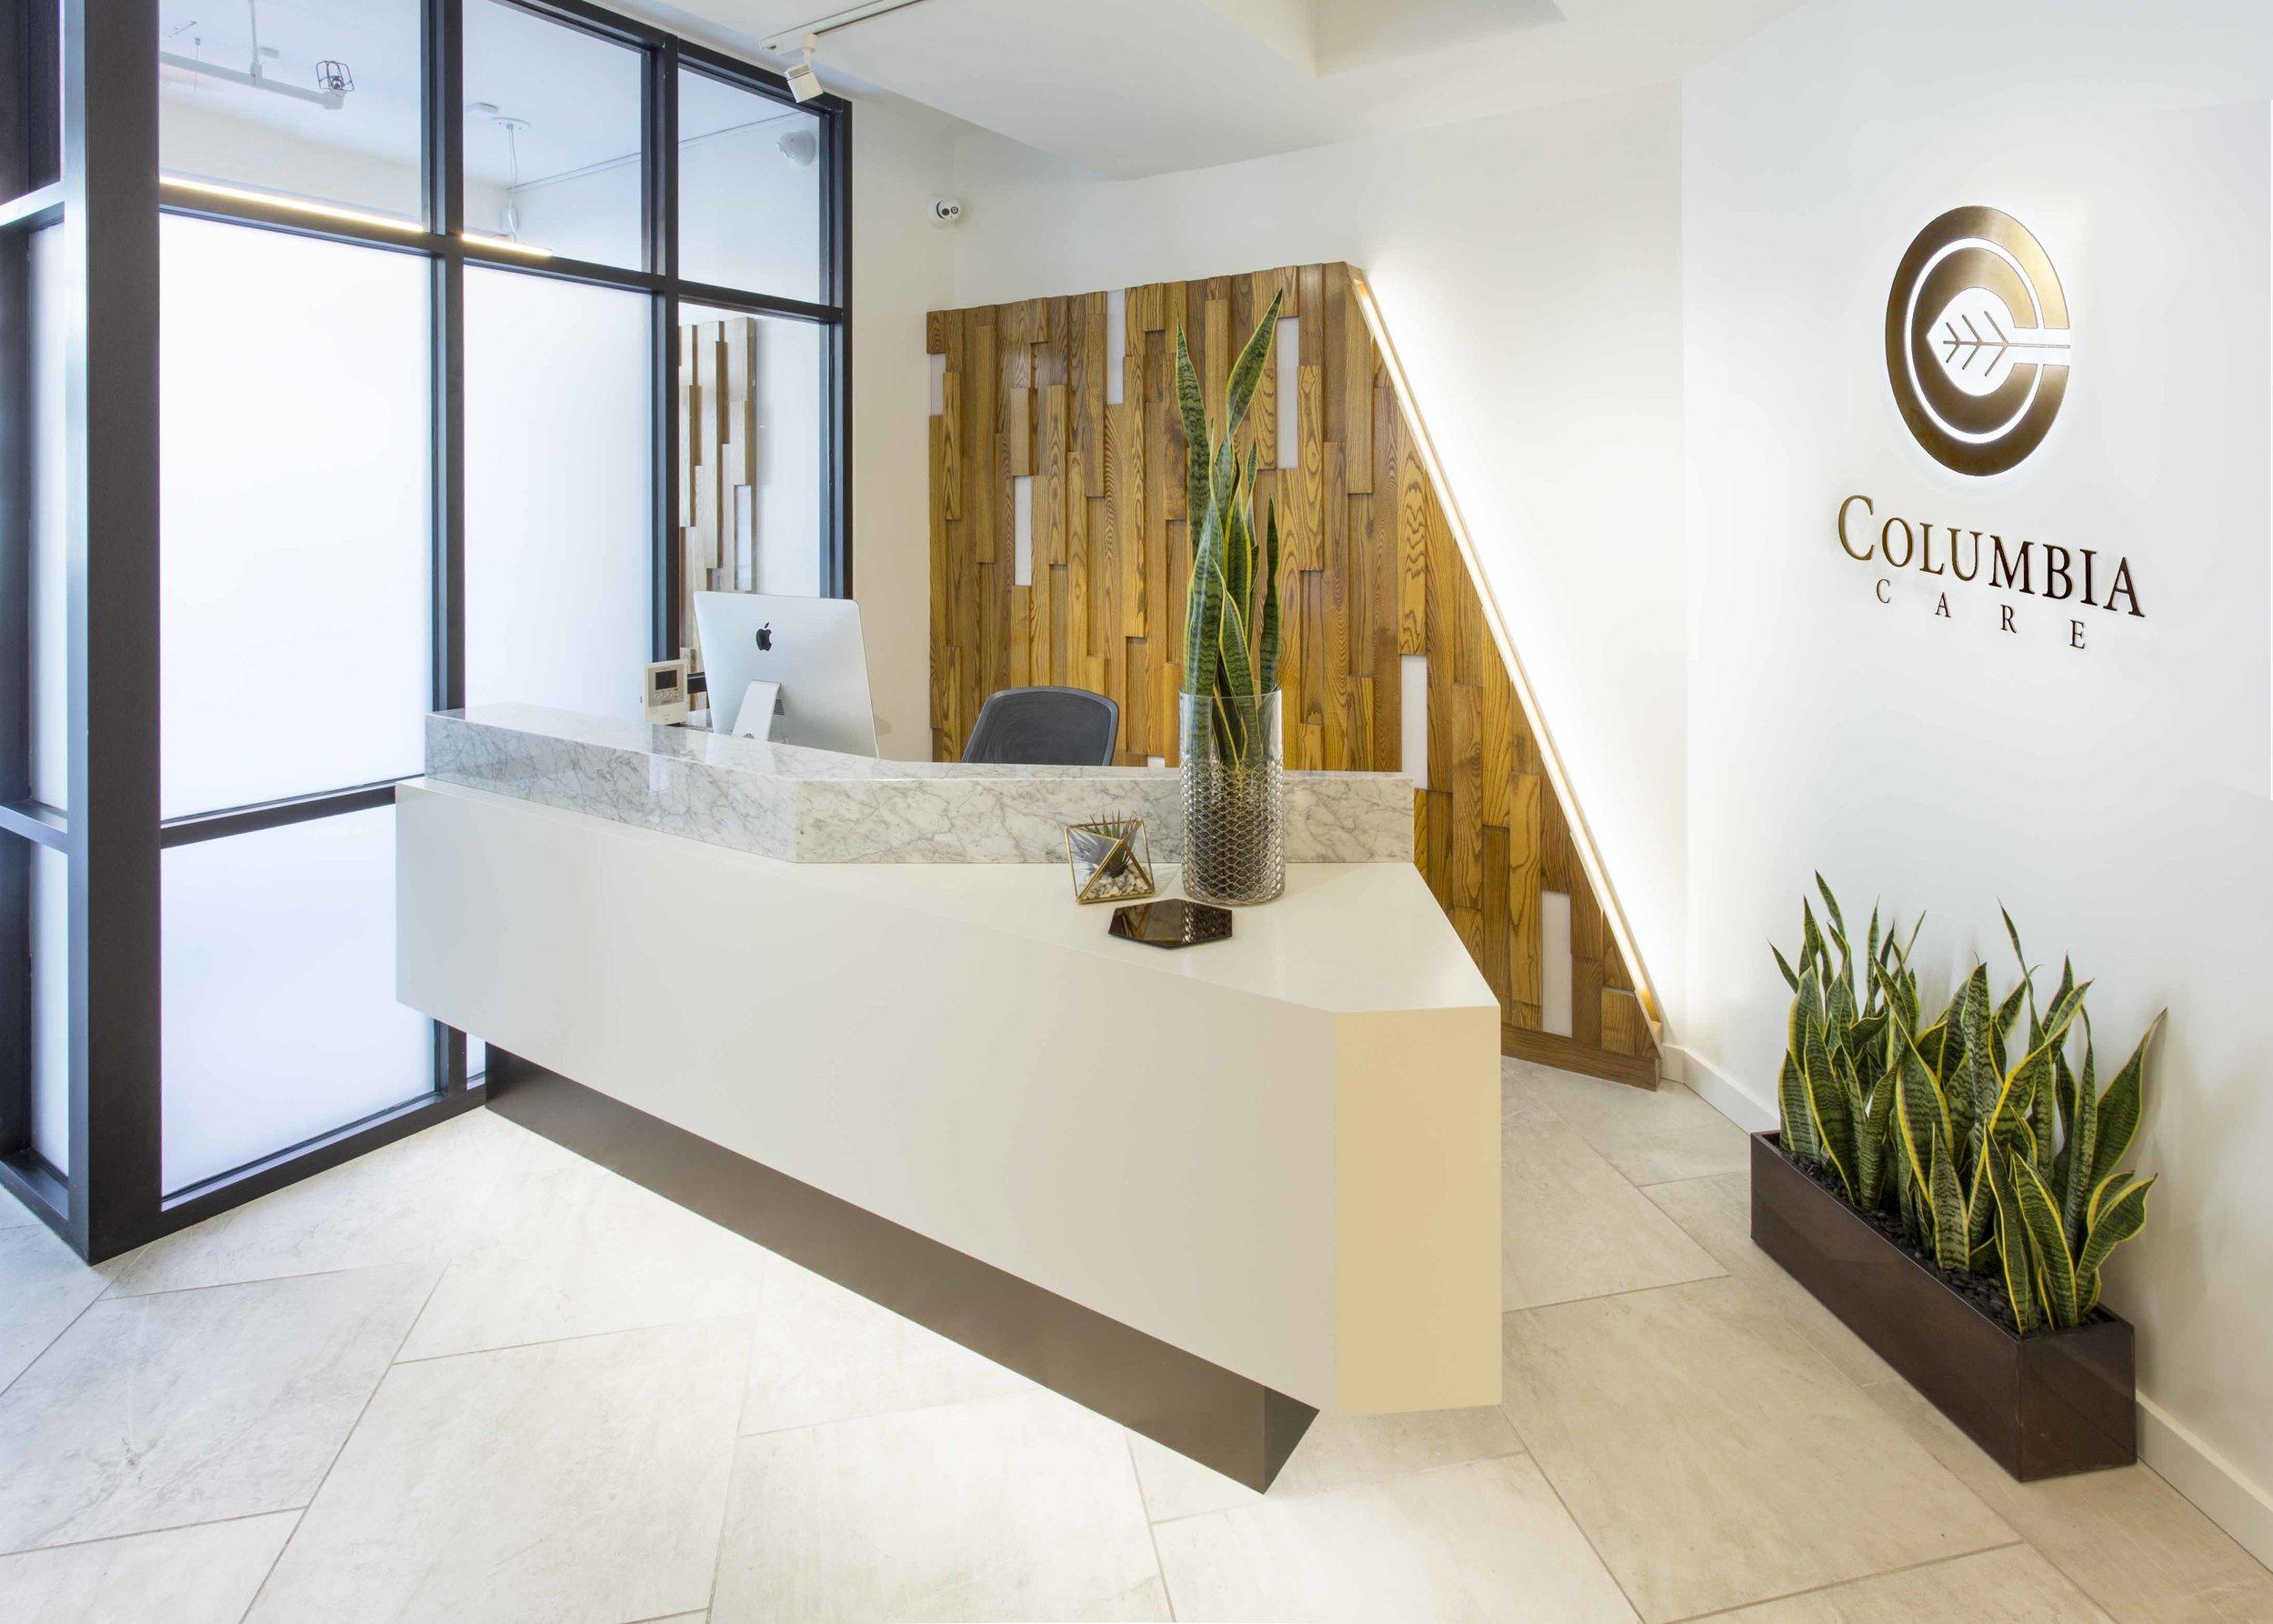 1-Columbia-Care-medical-marijuana-dispensary-reception-evangeline-dennie.jpg